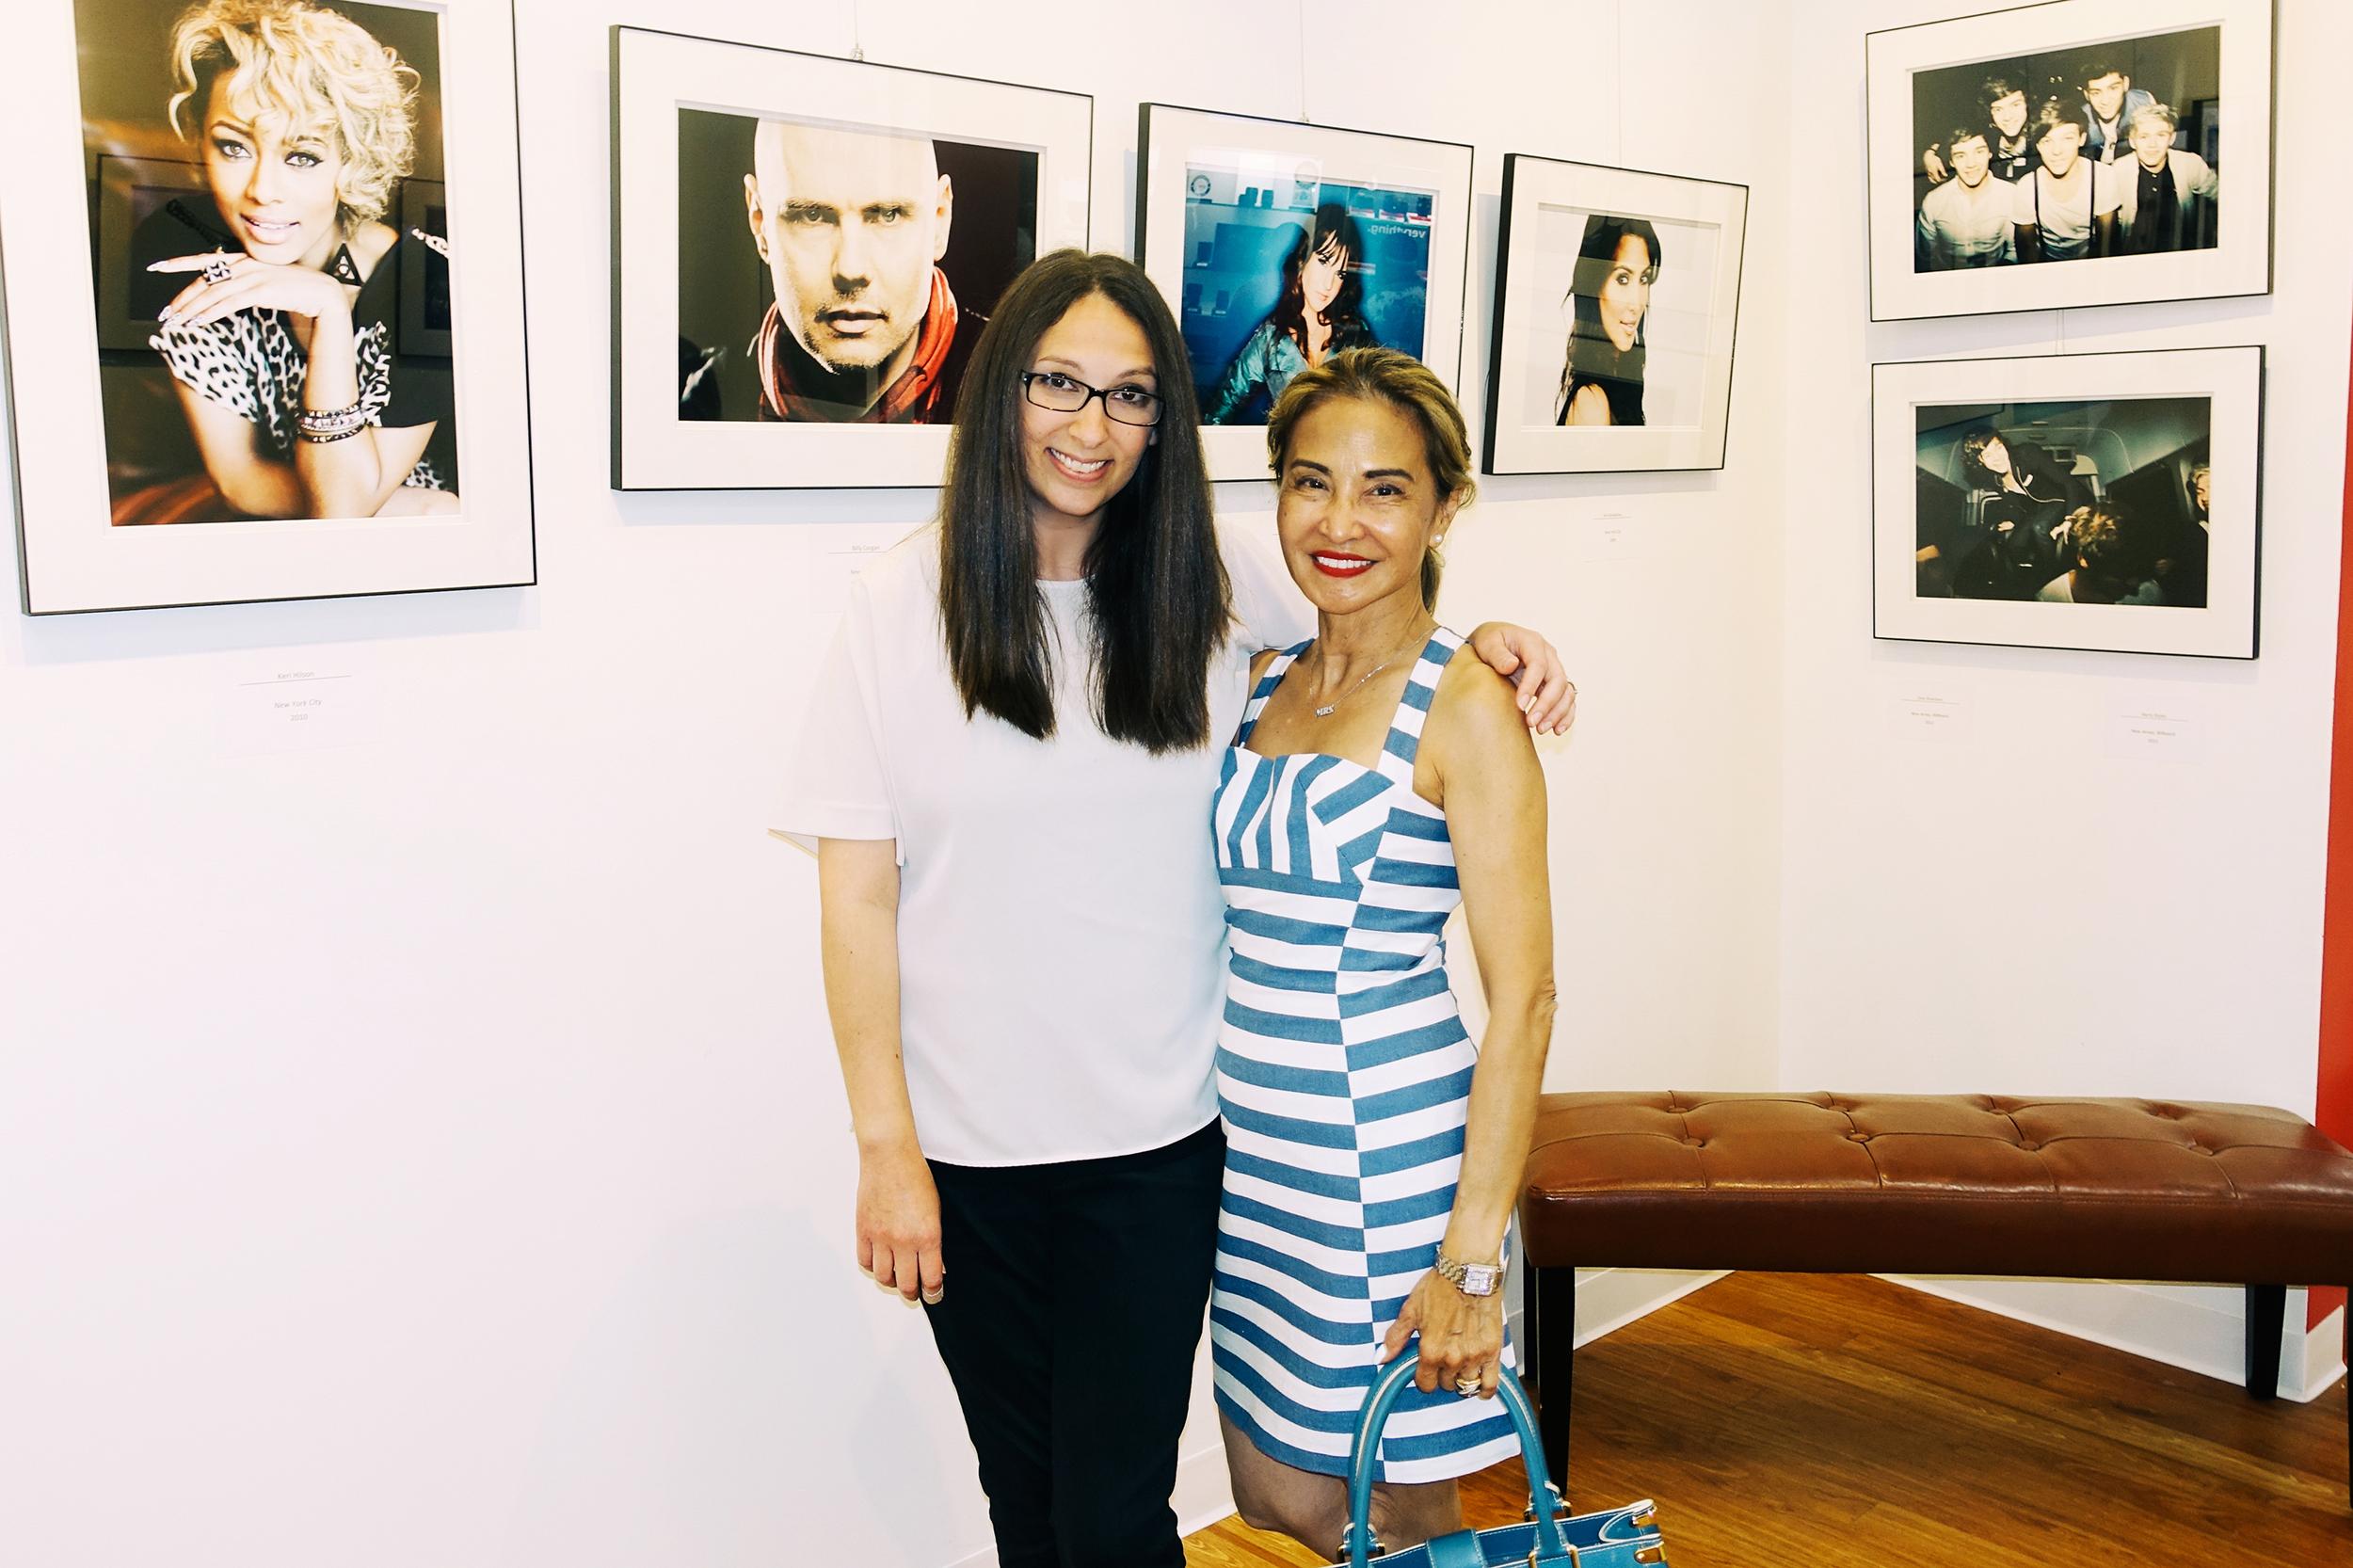 Diana Levine and Madeleine Capino